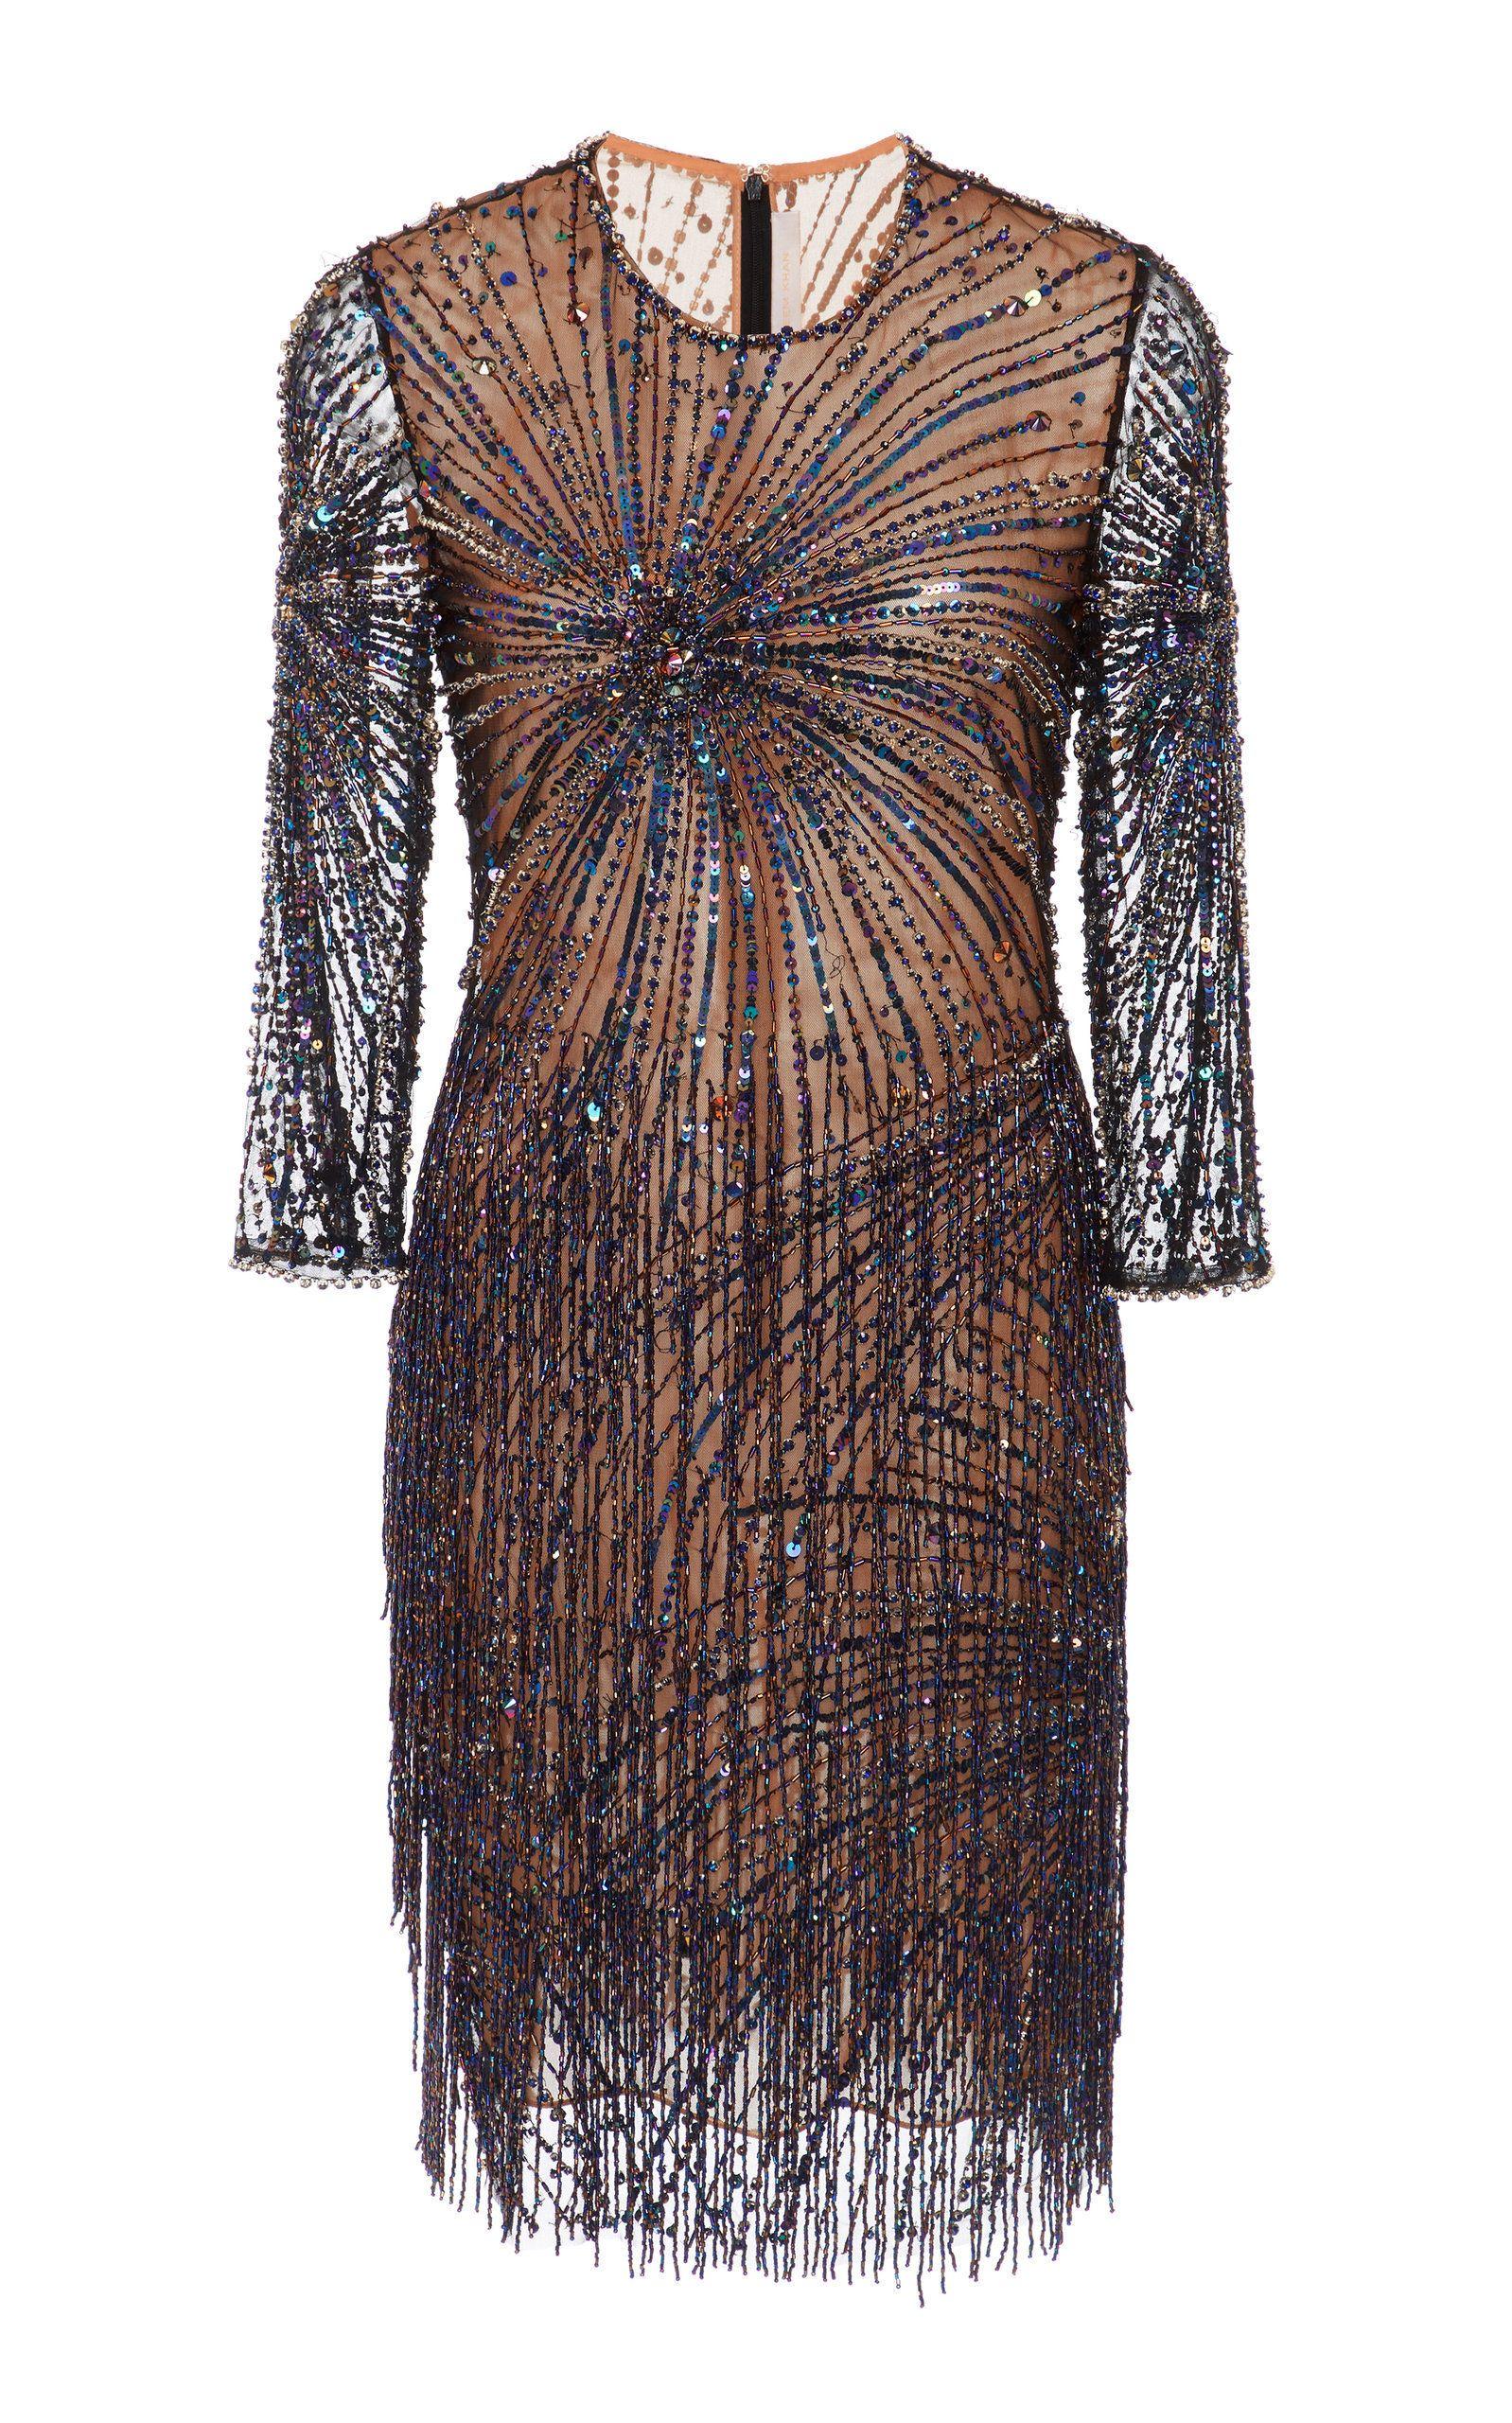 790924d418 Bead-Embellished Tulle Mini Dress by NAEEM KHAN Now Available on Moda  Operandi